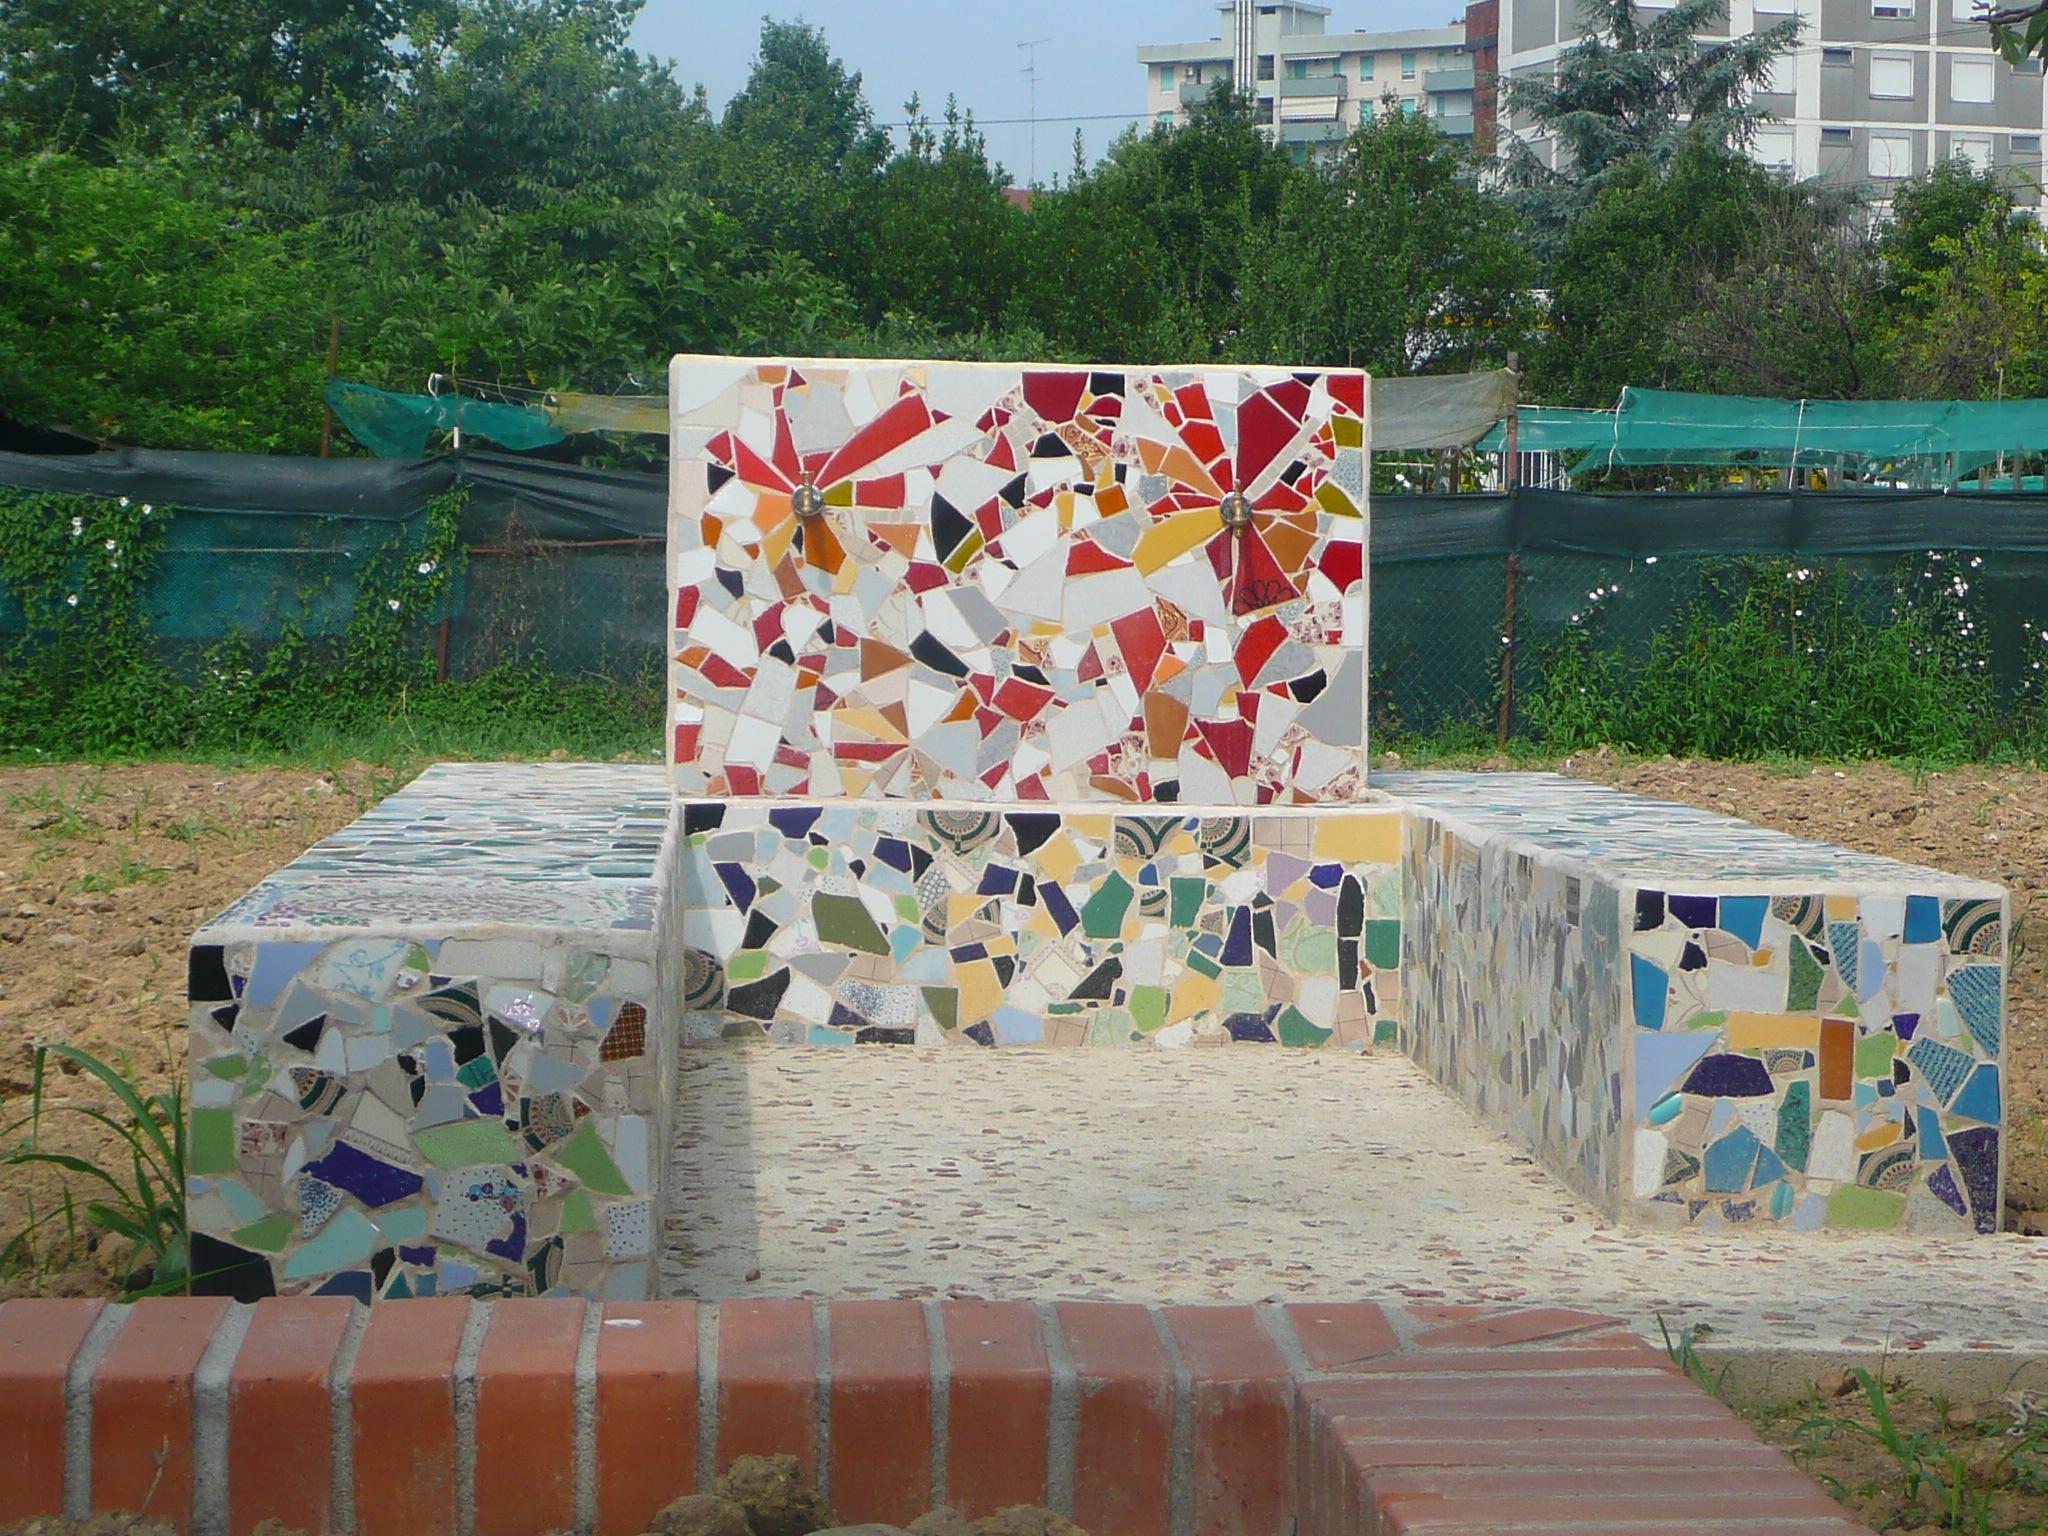 Vasca fontana a mosaico al Giardino degli orti